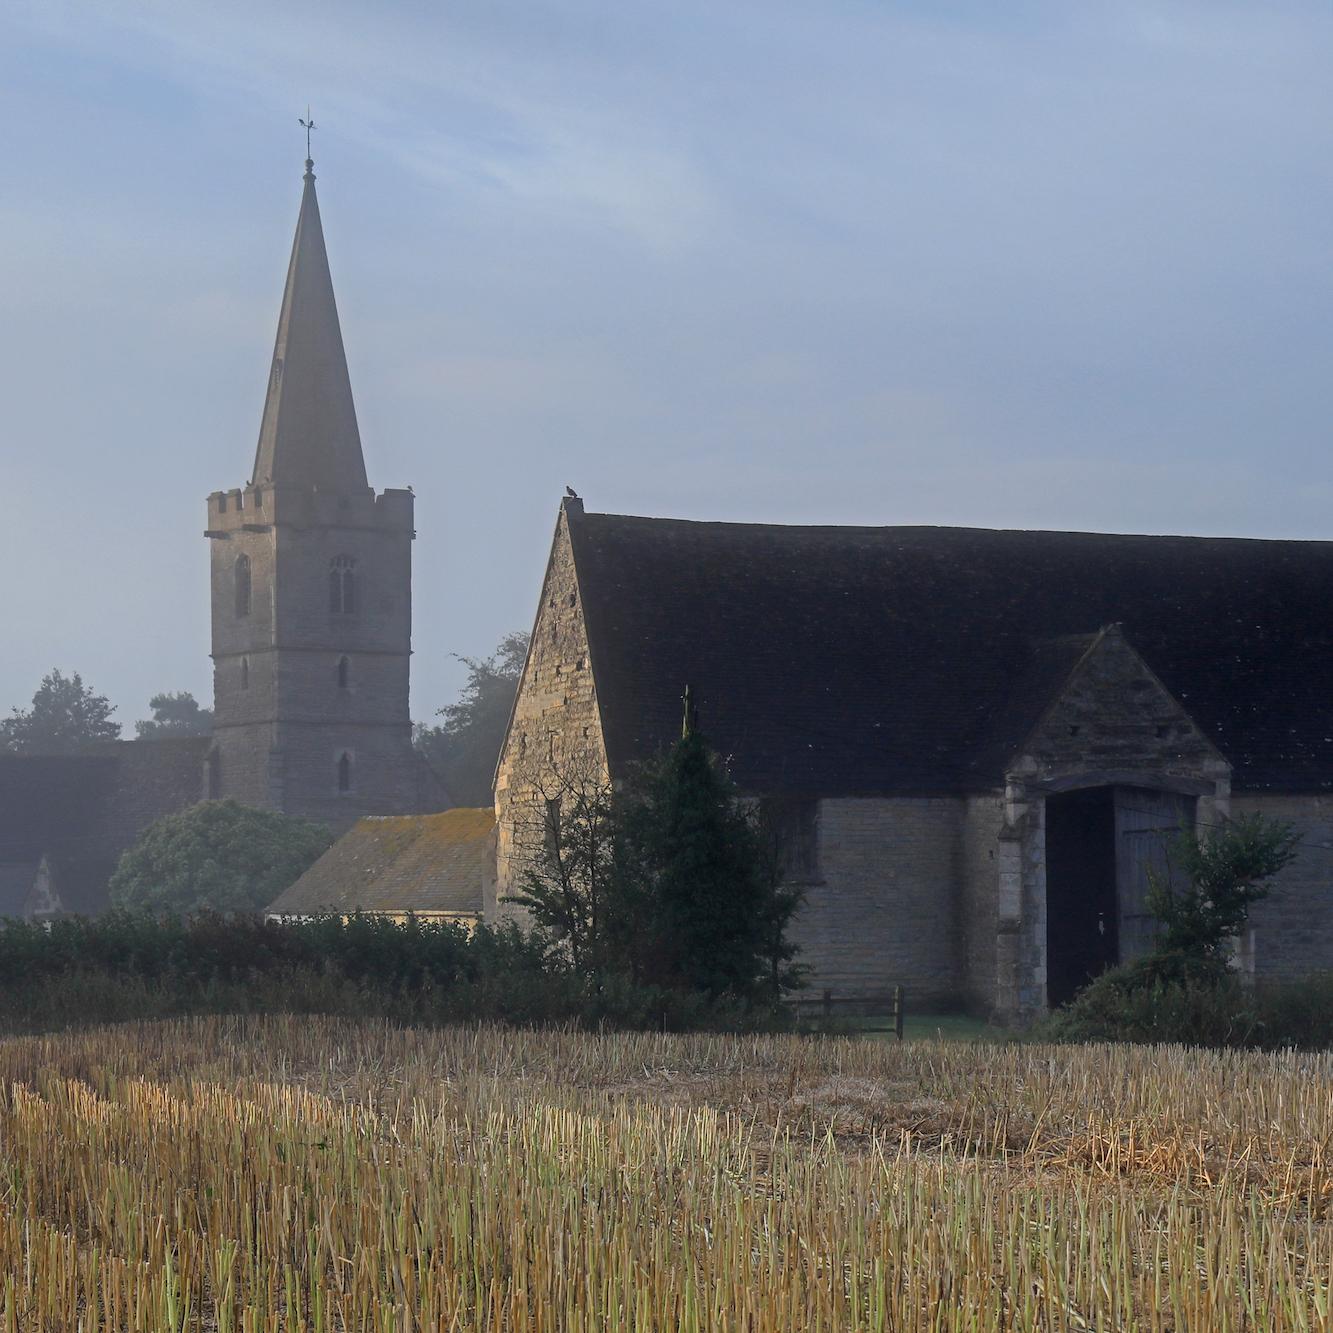 Ashleworth Church and Tithe Barn